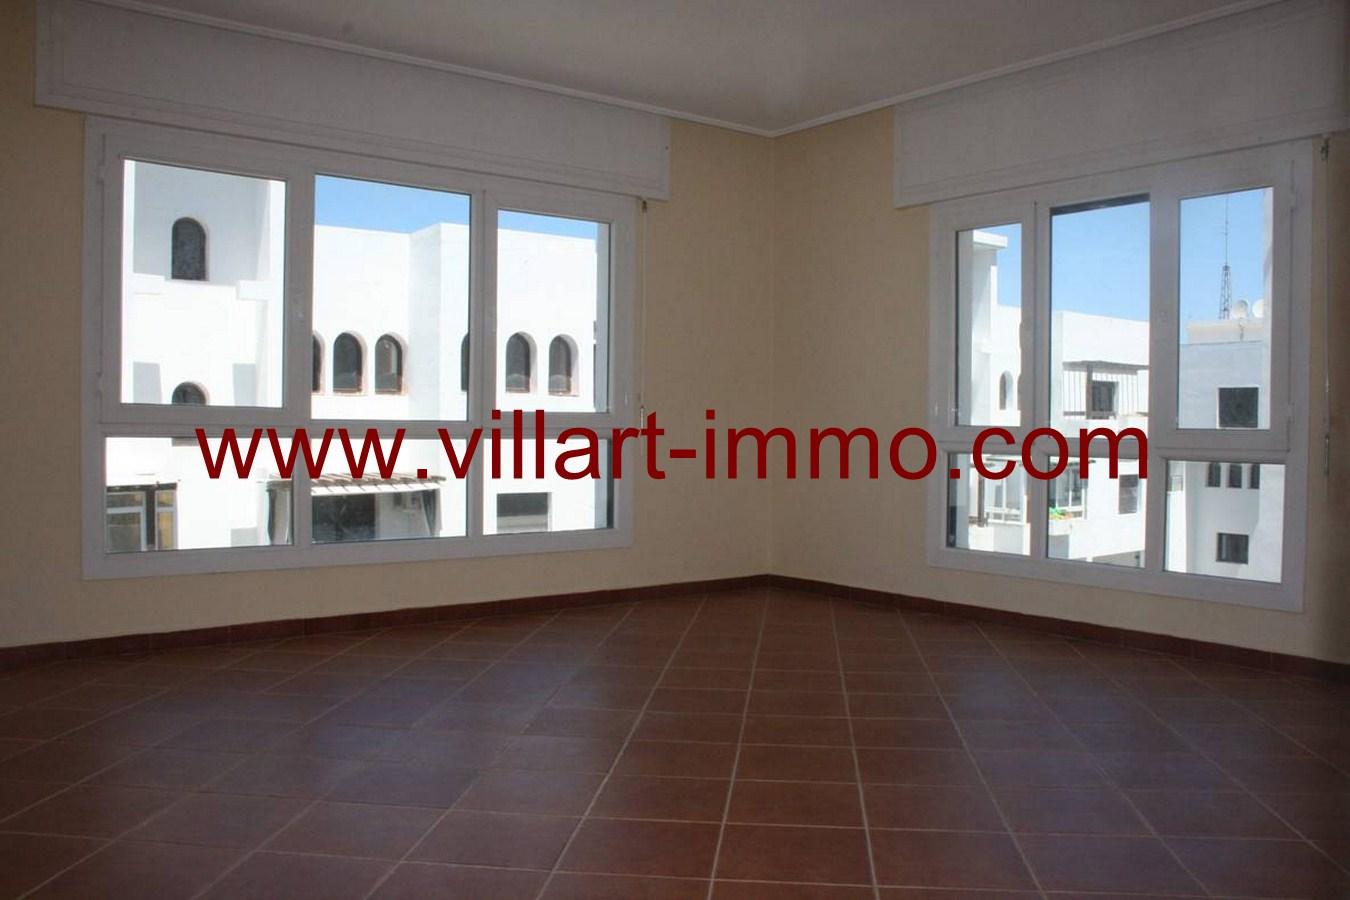 1-vente-appartement-tanger-malabata-salon-1-va453-villart-immo